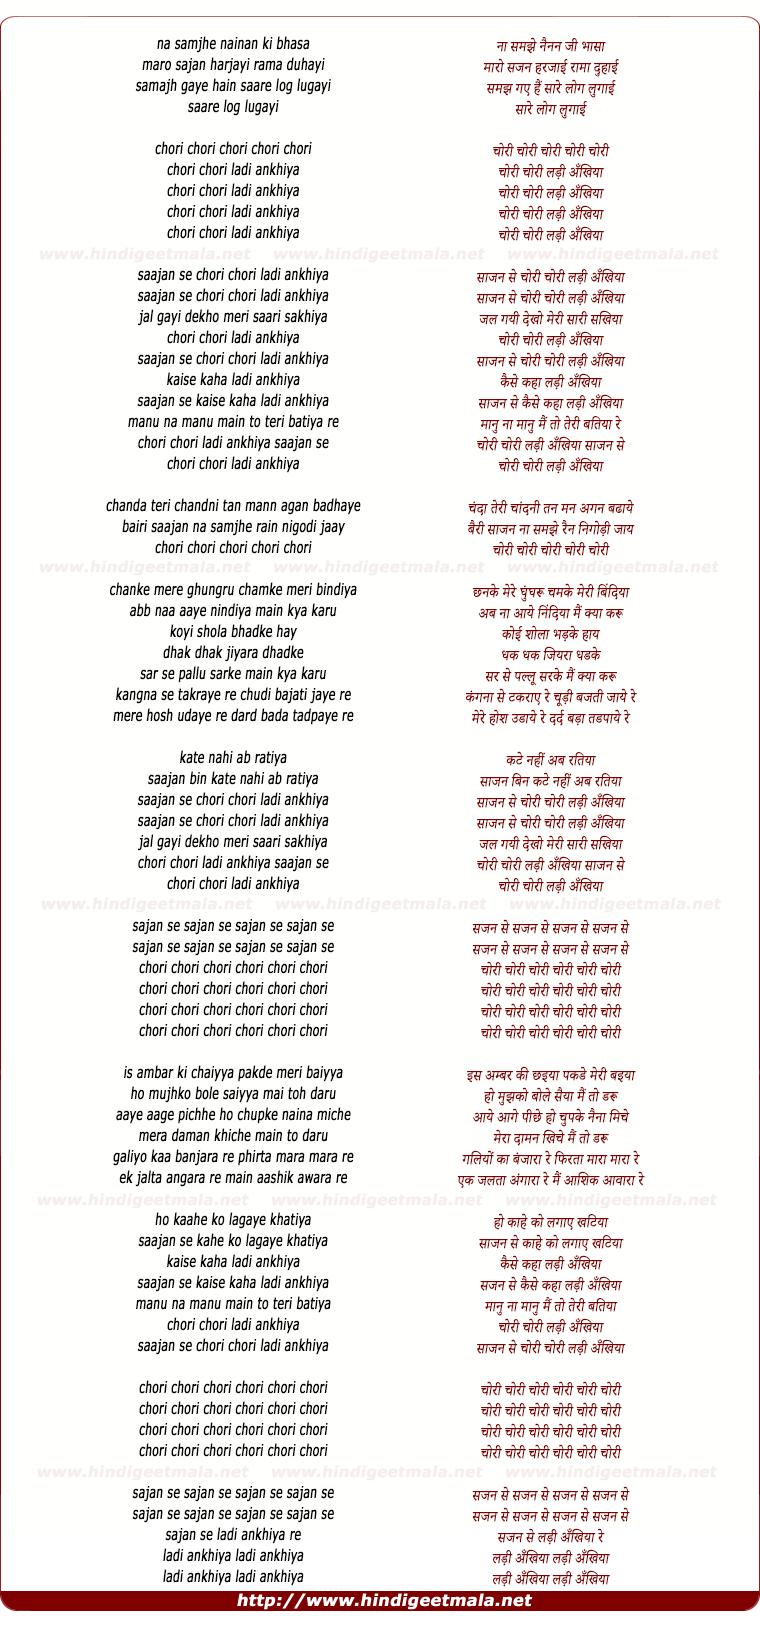 lyrics of song Chori Chori Ladi Ankhiya